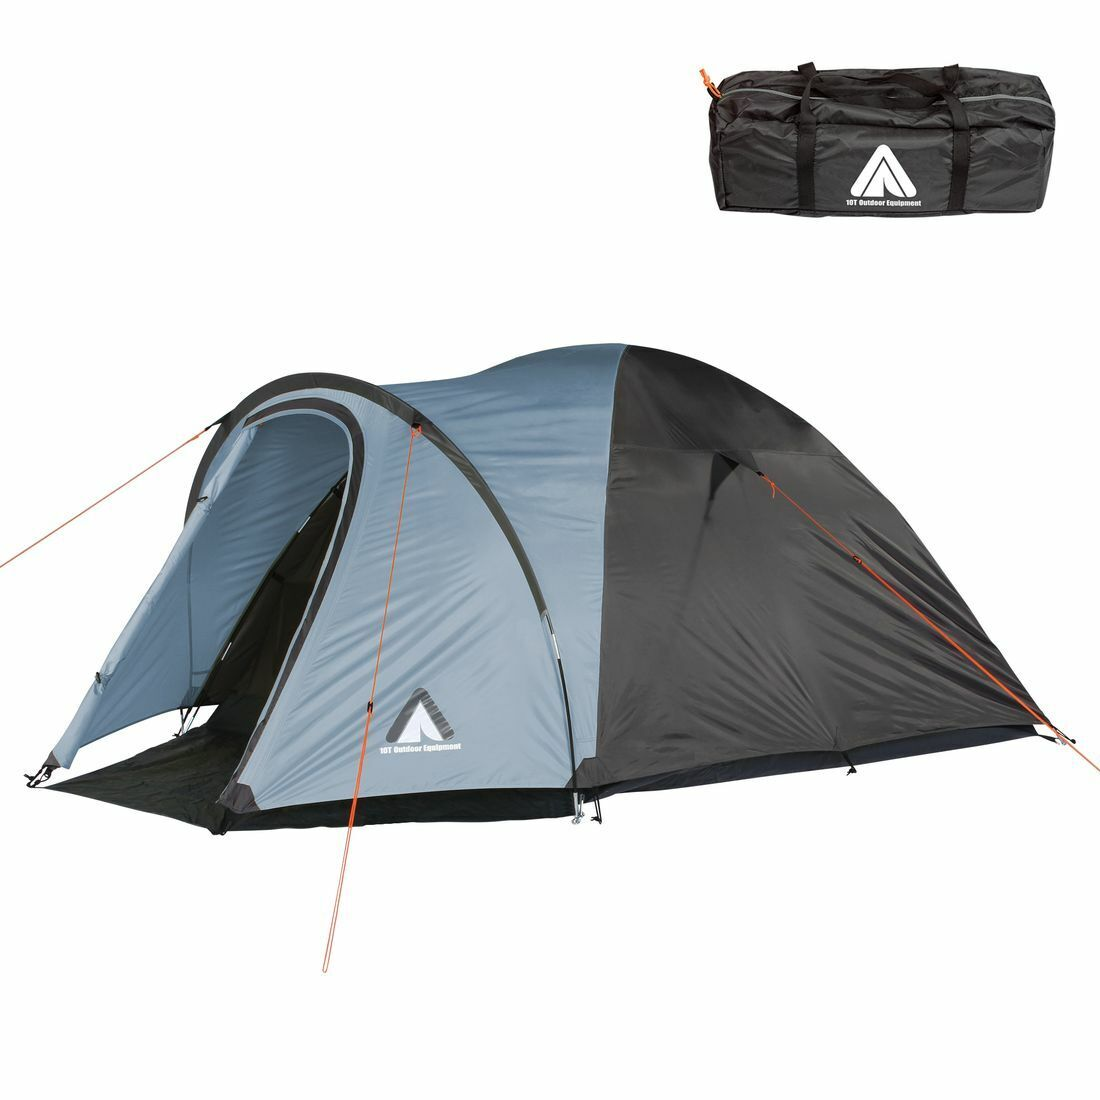 Scone Arona 3 Mann Zelt Kuppelzelt Campingzelt Igluzelt wasserdicht 5000mm